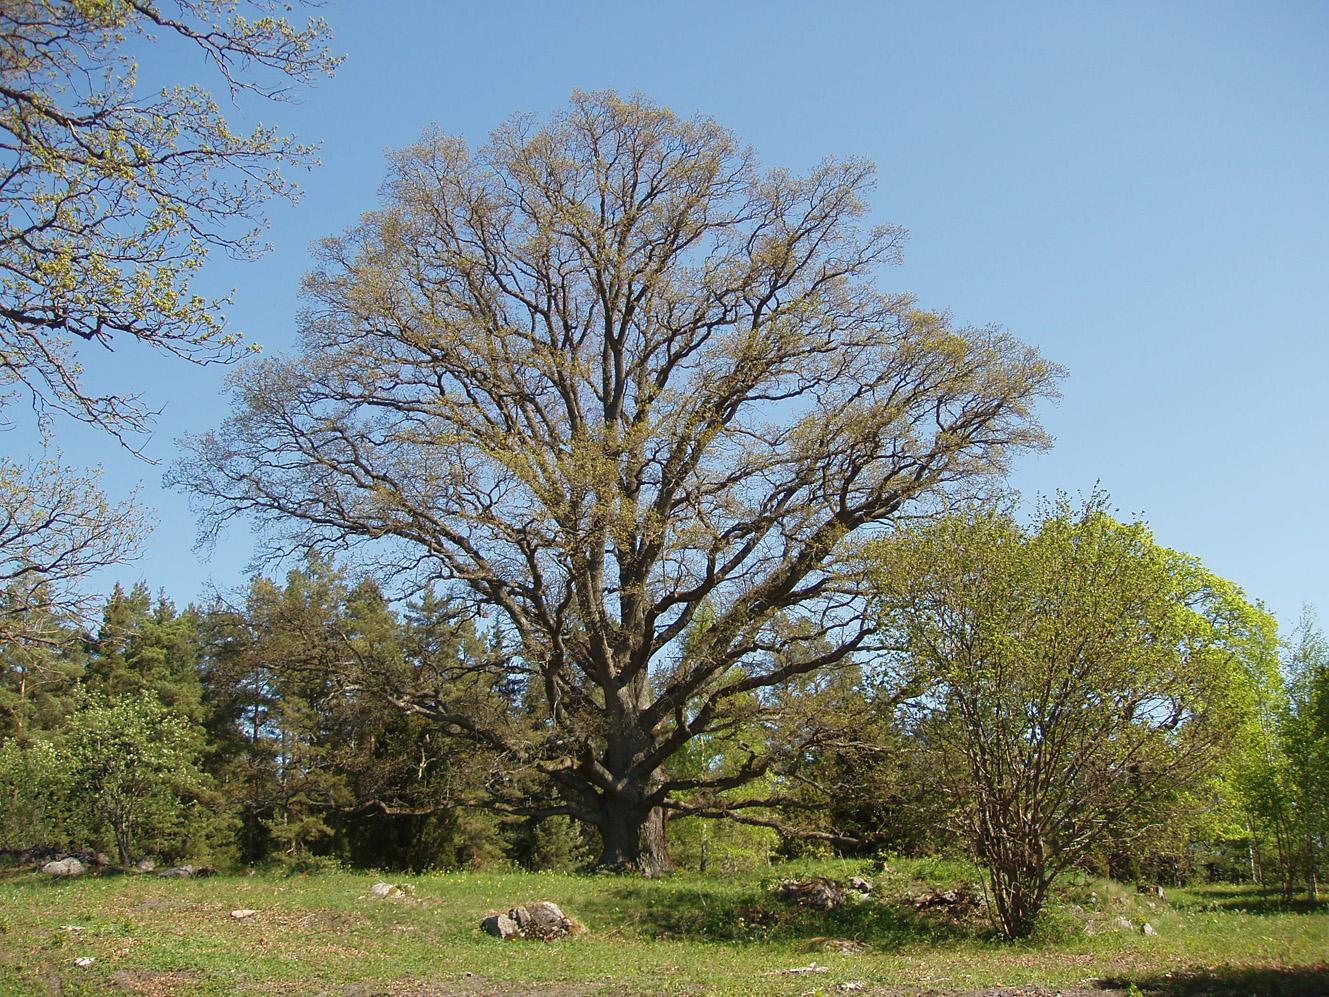 Depiction of Quercus